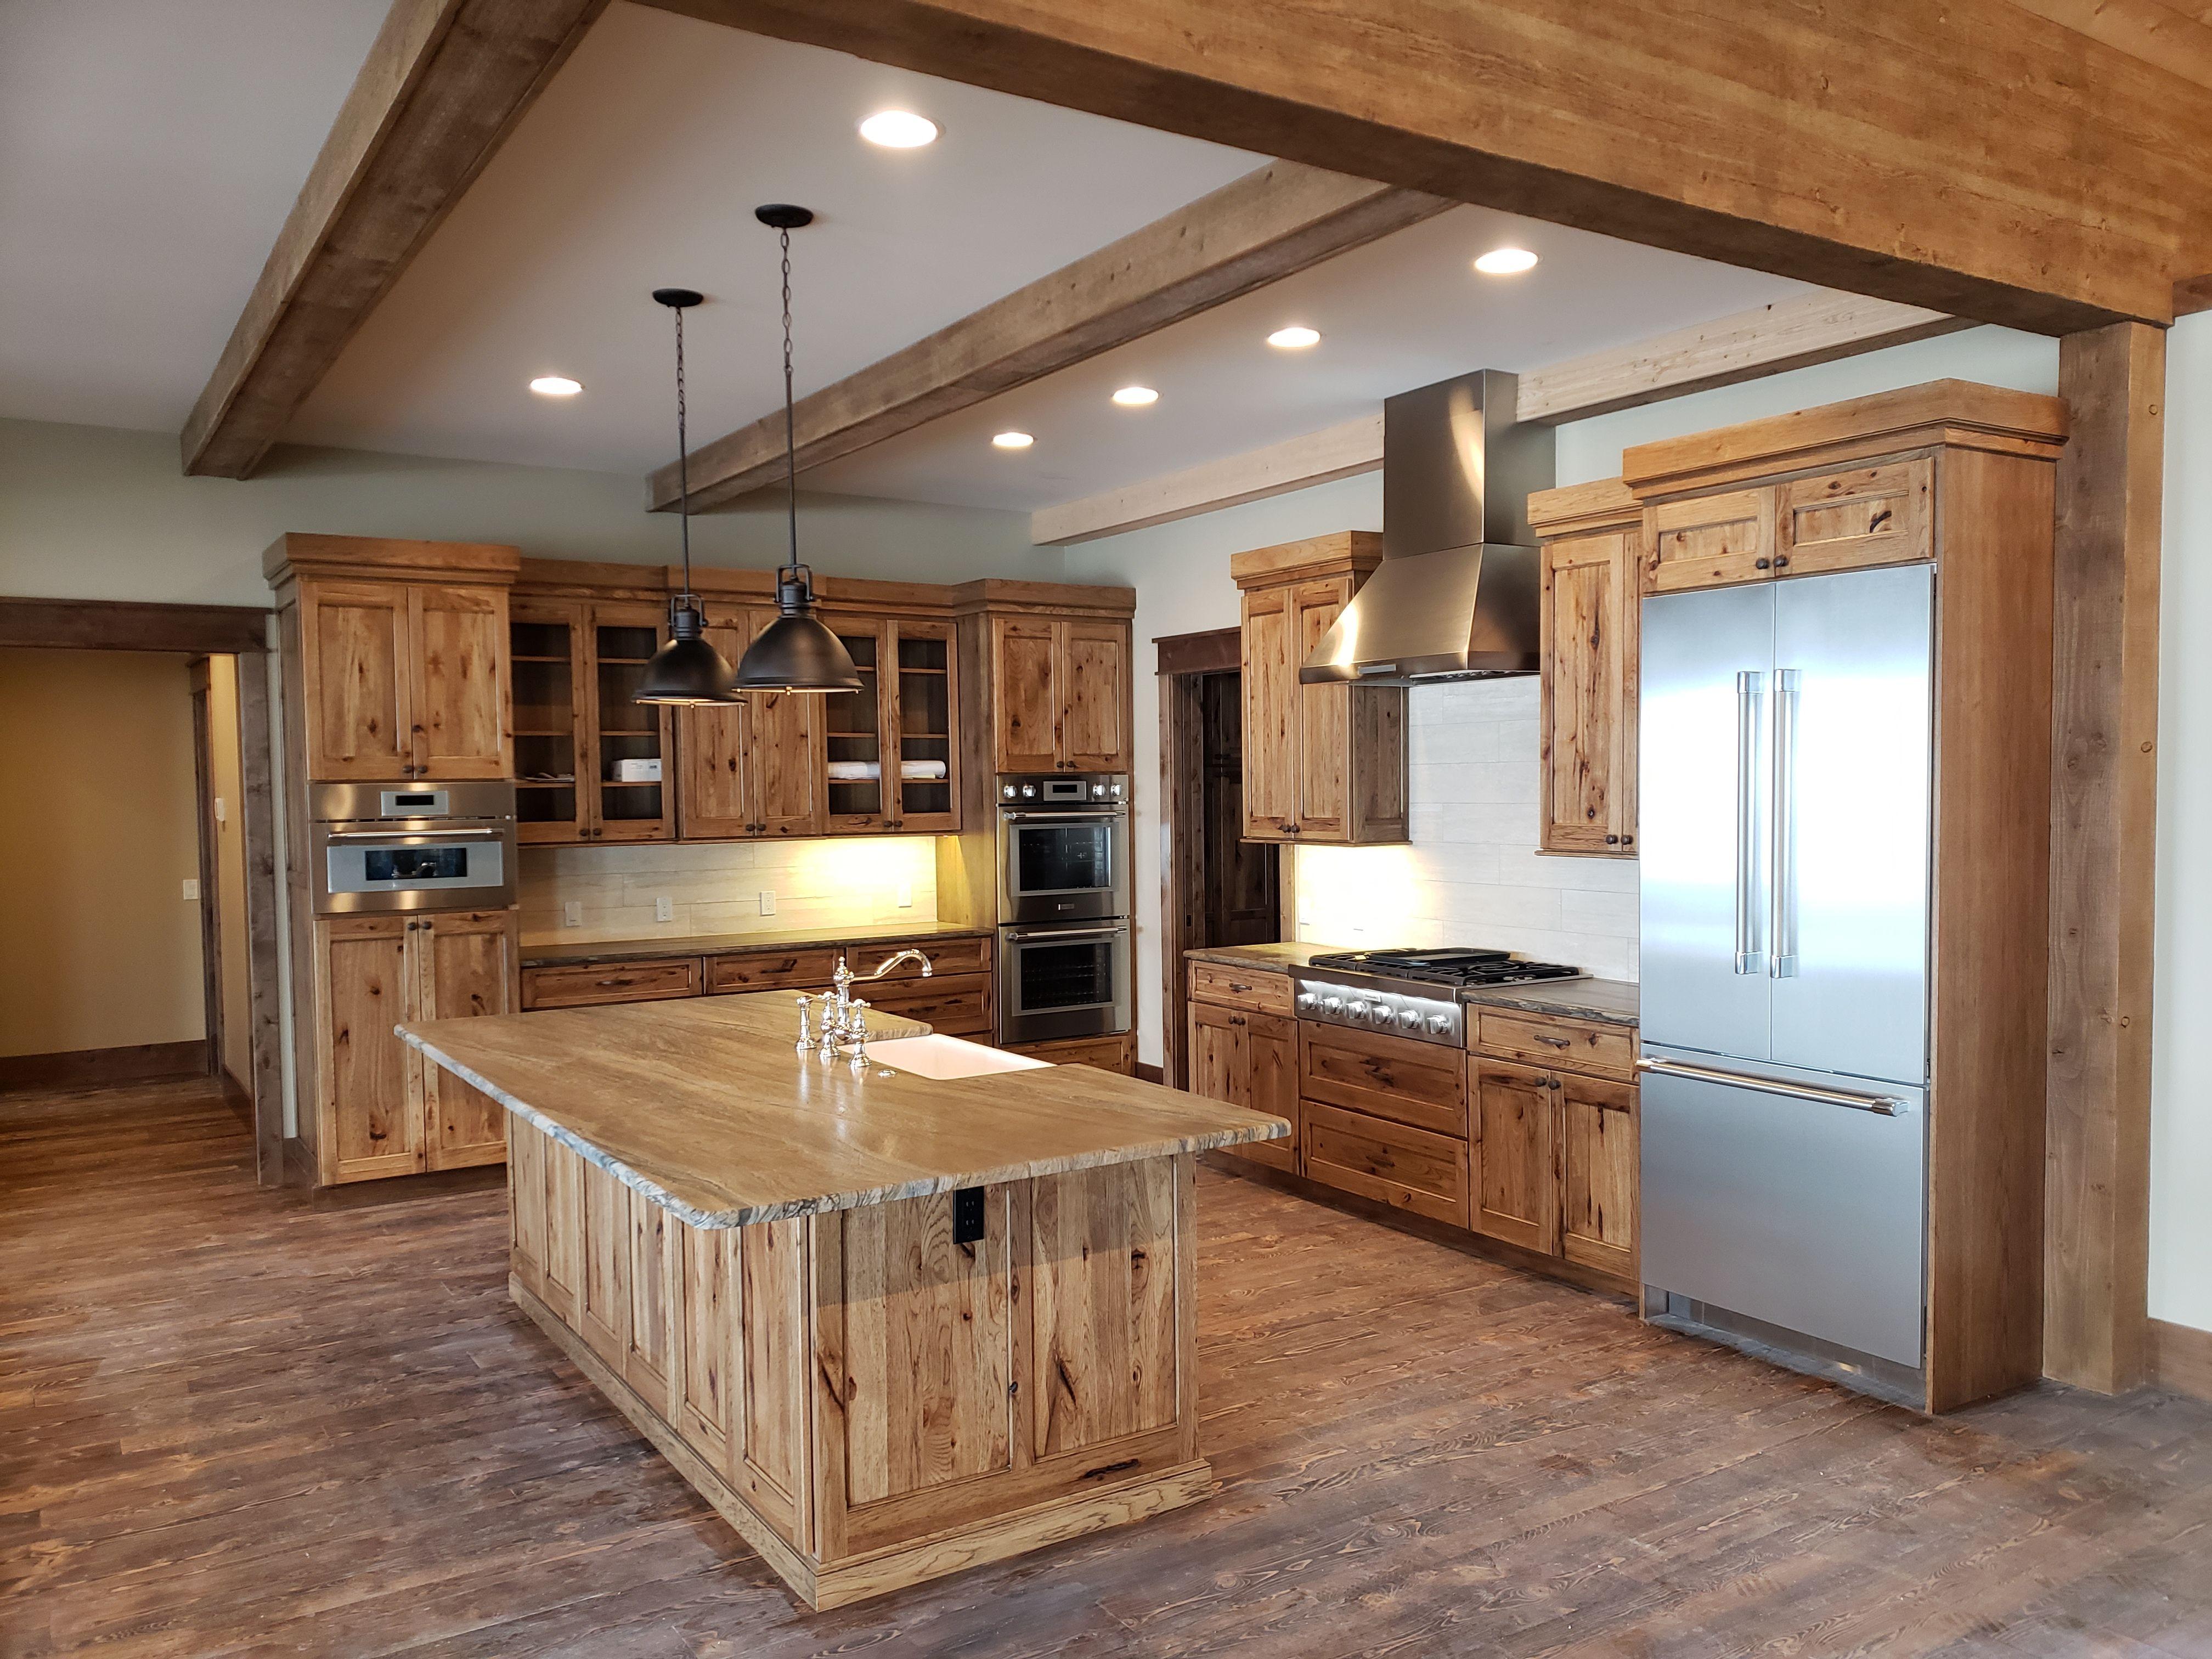 Home Interior design solutions, Rustic hickory